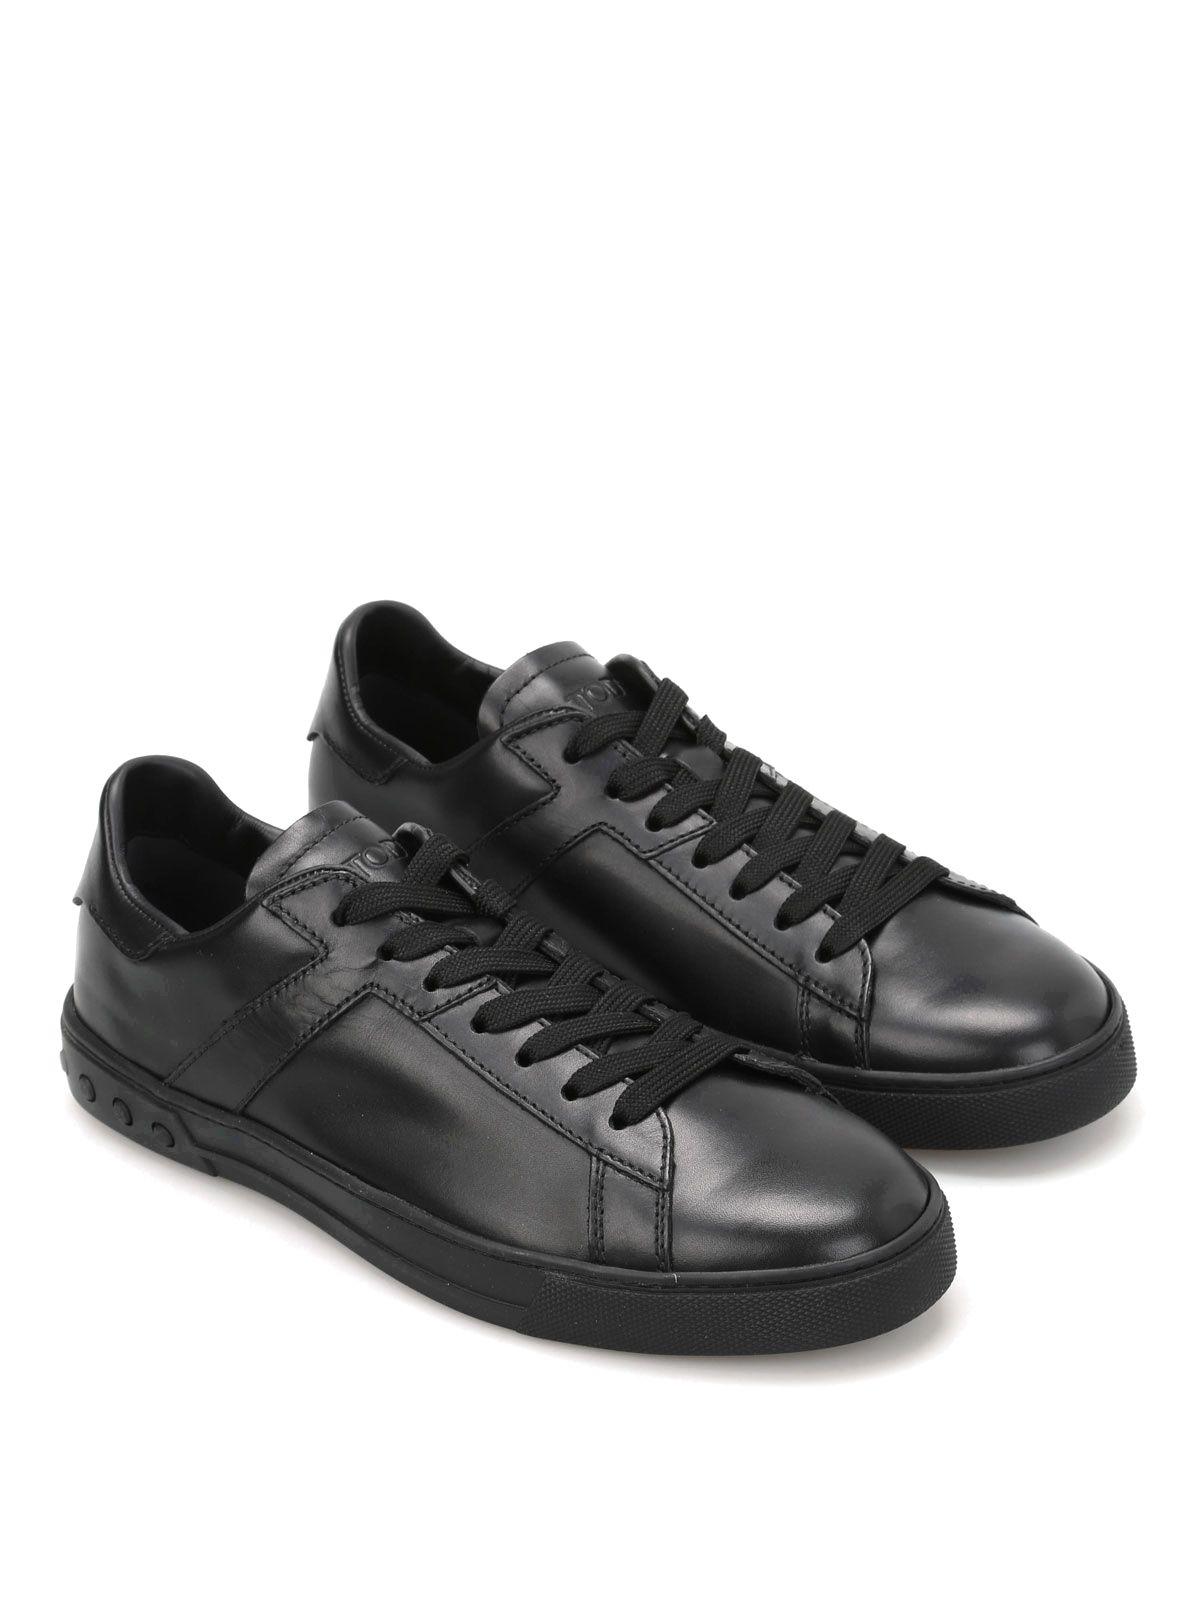 Tods Nuovo Allacciata Sneakers